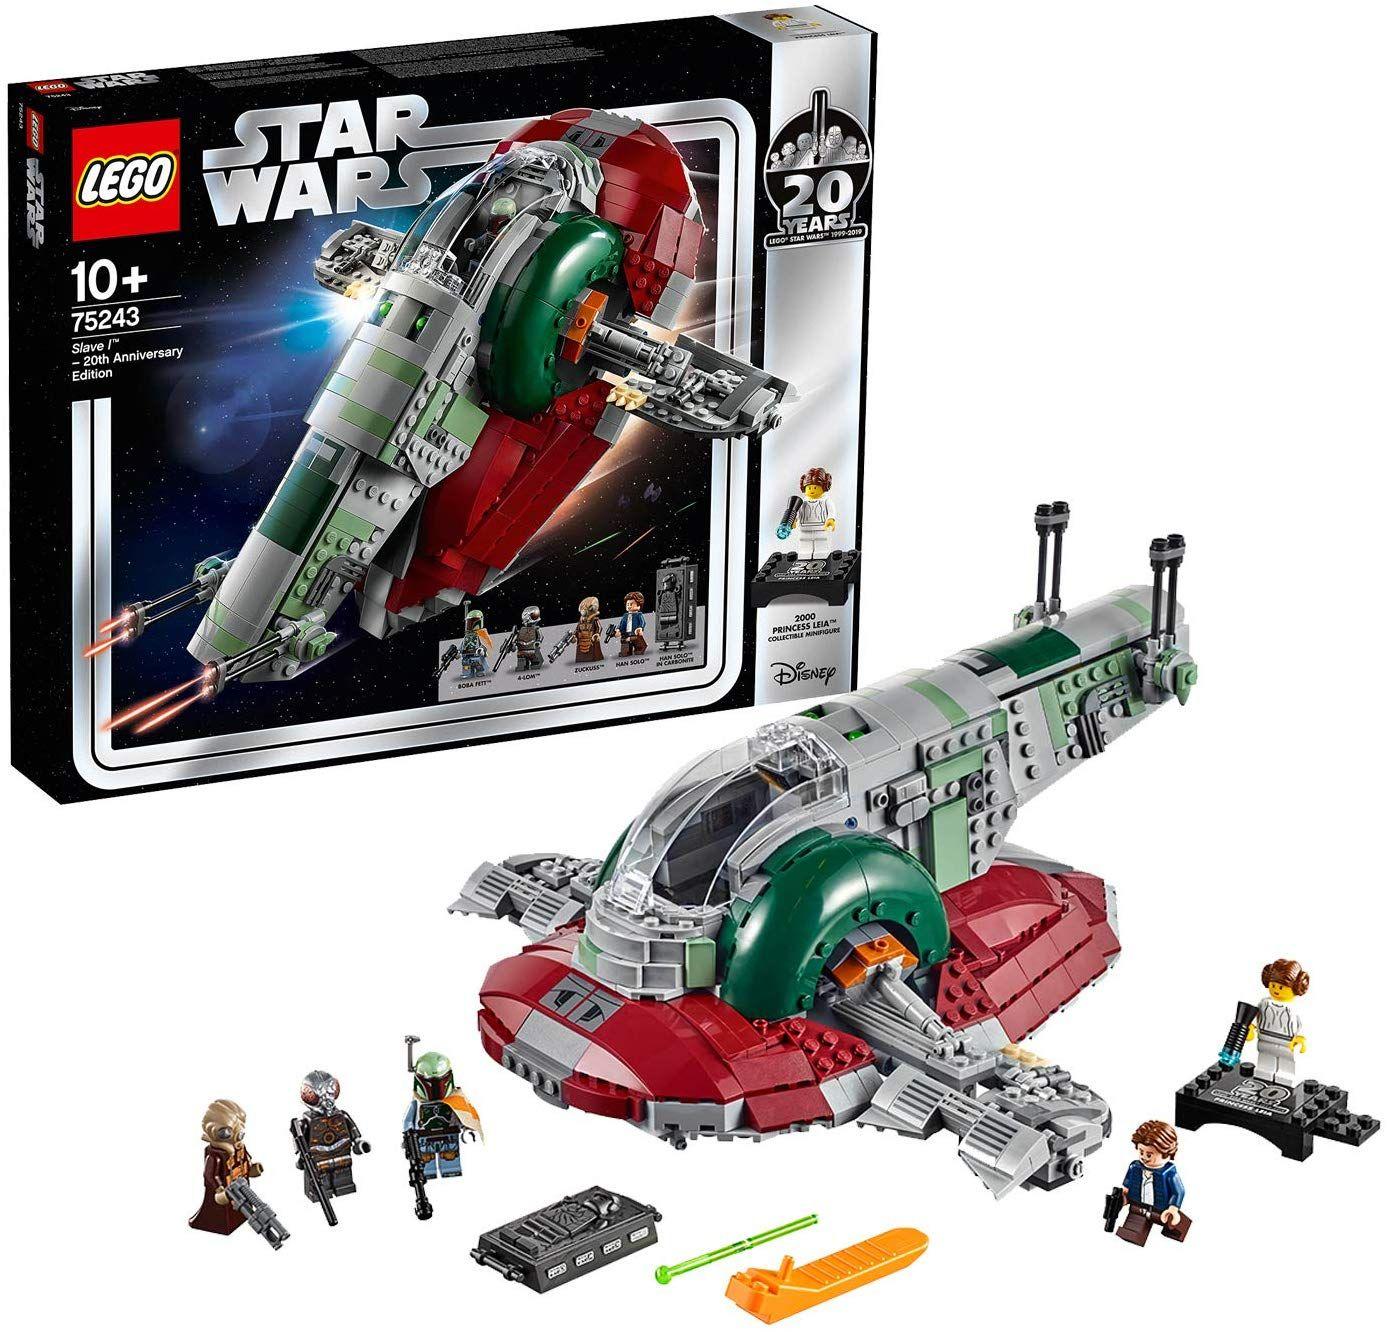 LEGO - Star Wars Slave I 20th Anniversary Edition